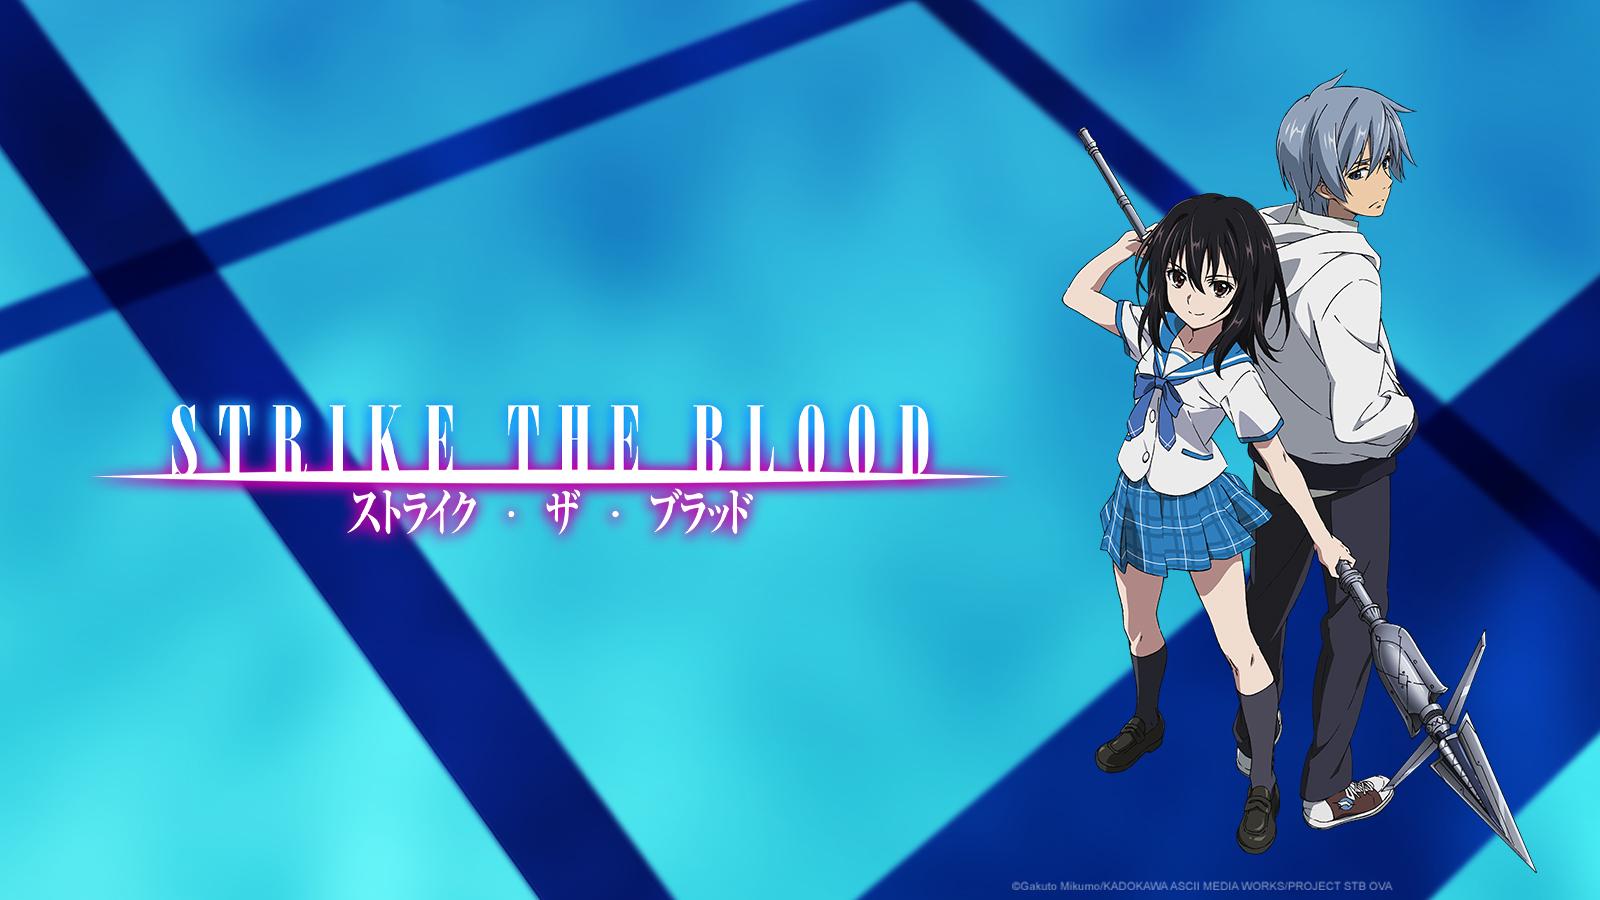 STRIKE THE BLOOD OVA